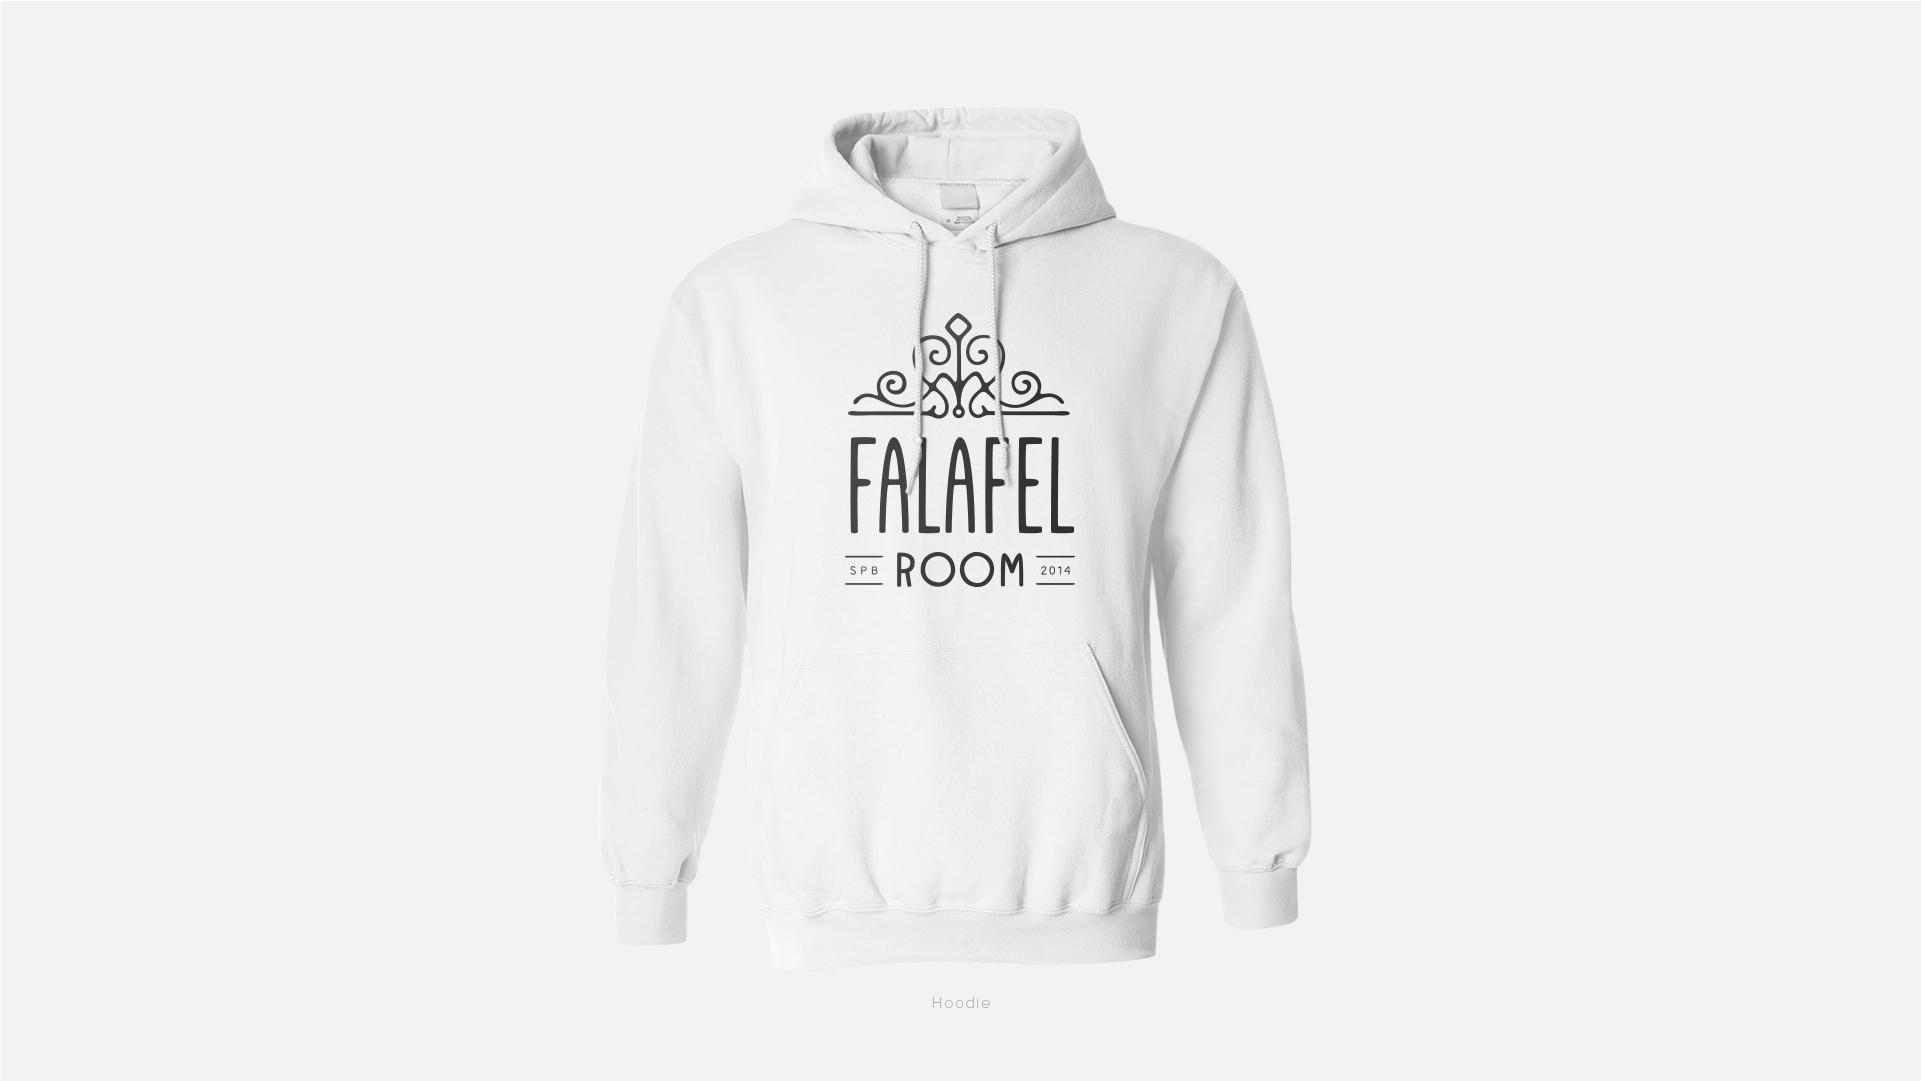 Falafel Room